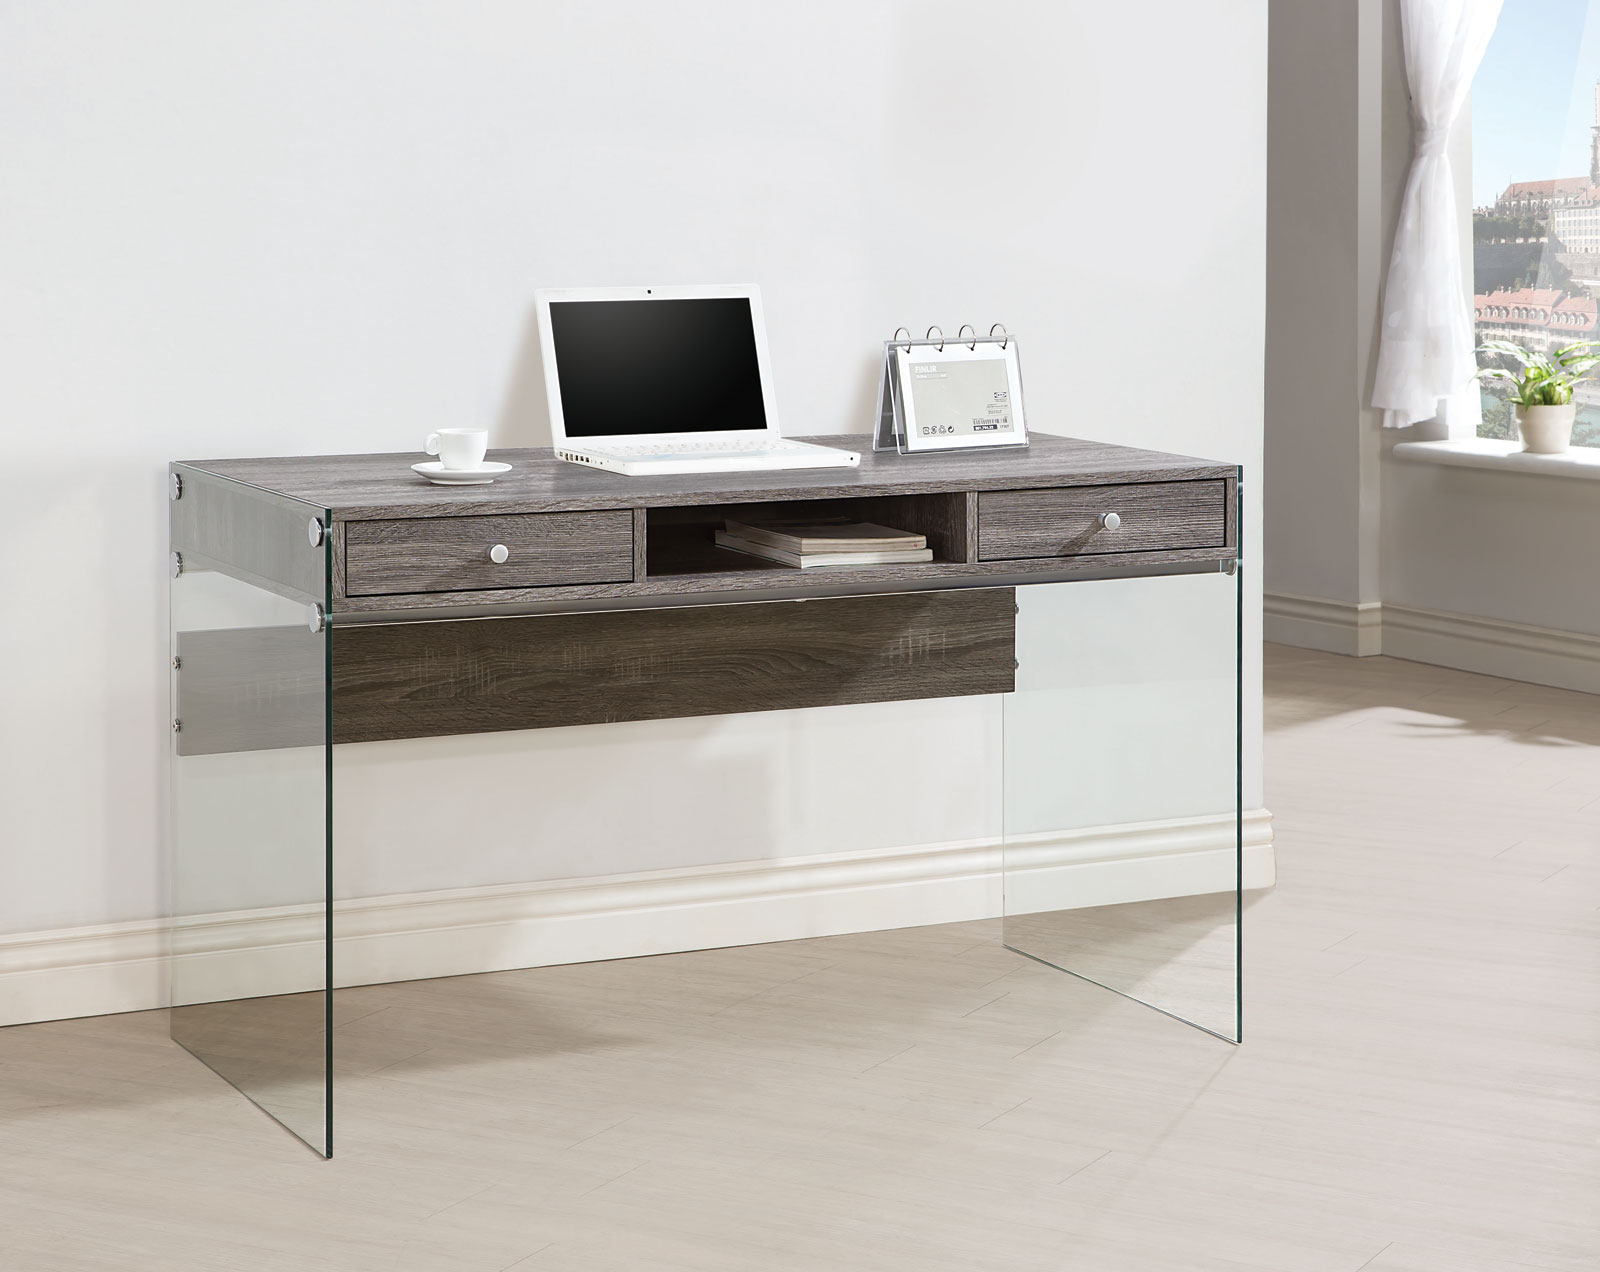 sofa mart dining tables sure fit spectator canvas slipcover arlington weather grey office desk | las vegas furniture ...